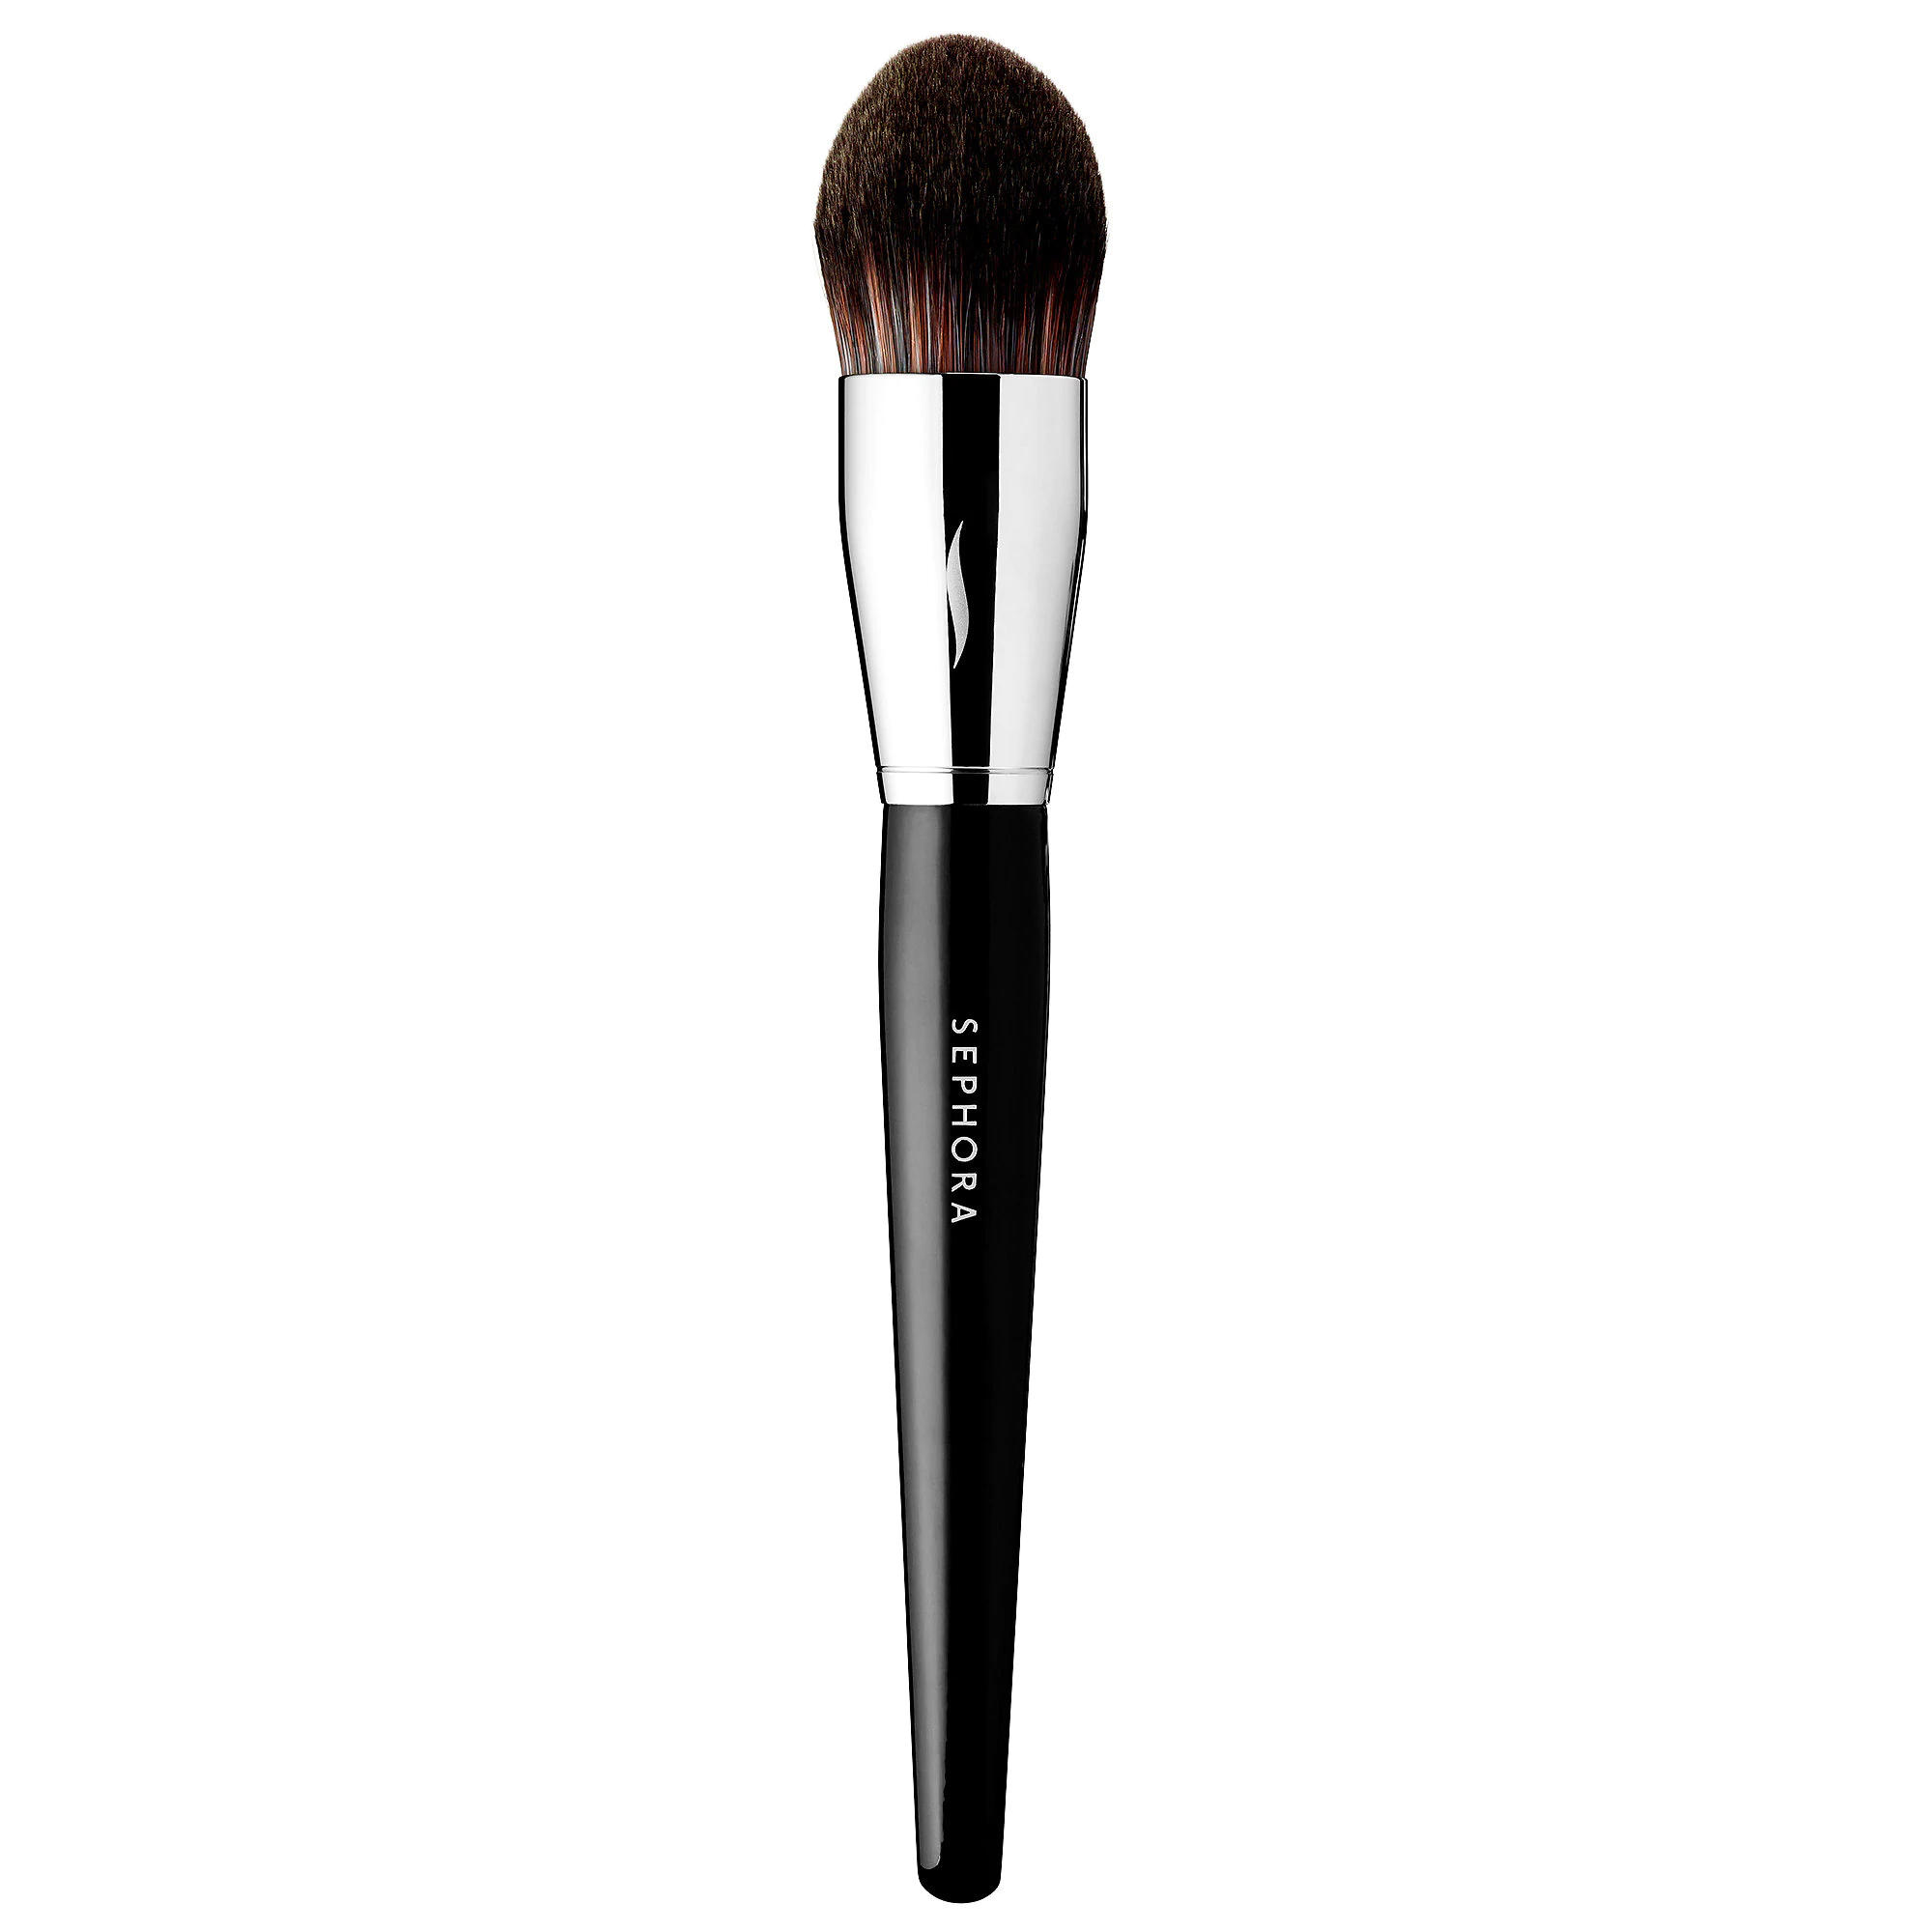 Sephora PRO Domed Foundation Brush #78